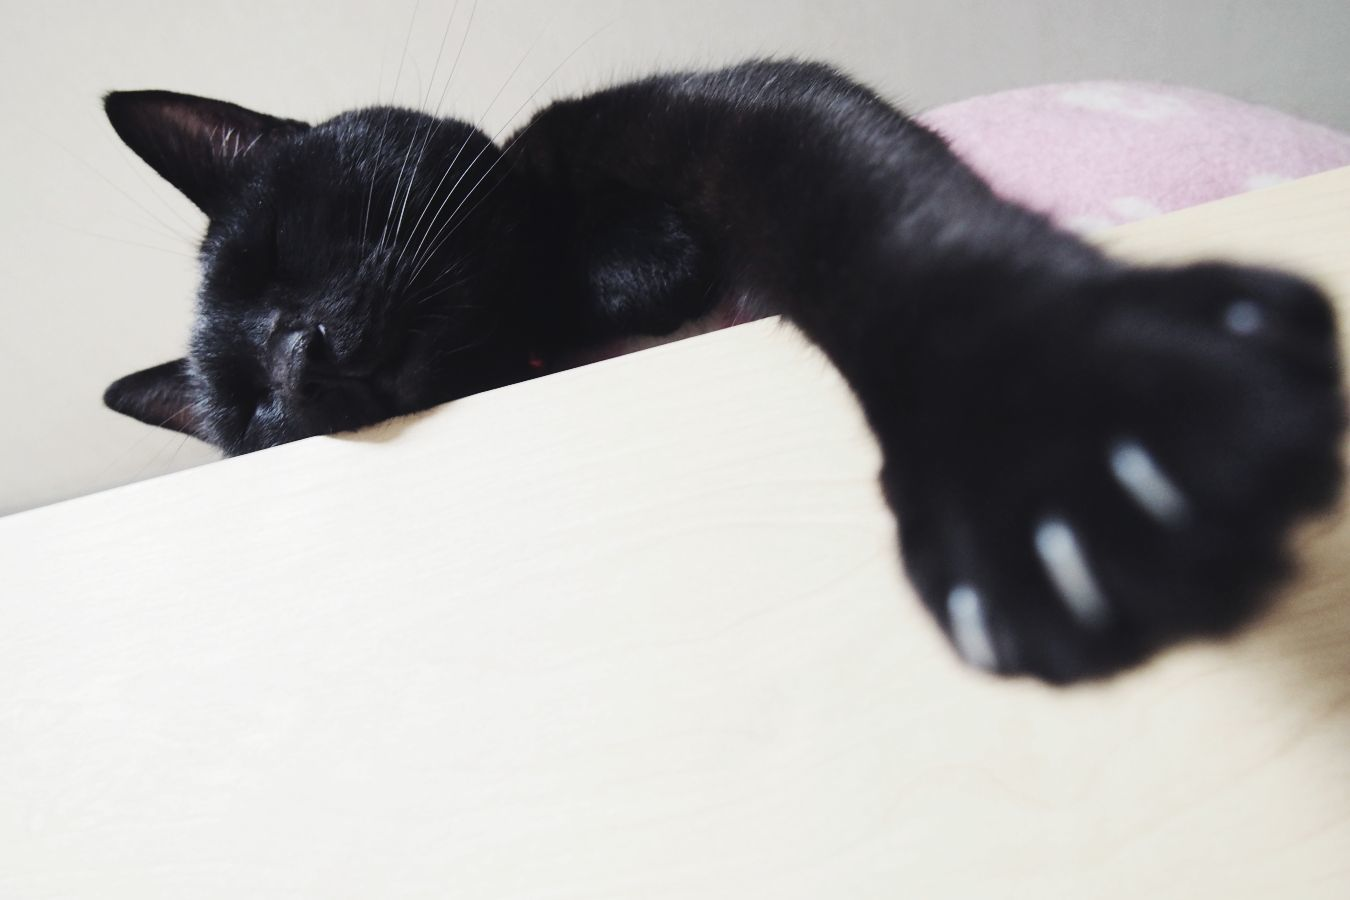 【Photo】ハロウィンは、黒猫_b0008655_19412779.jpg